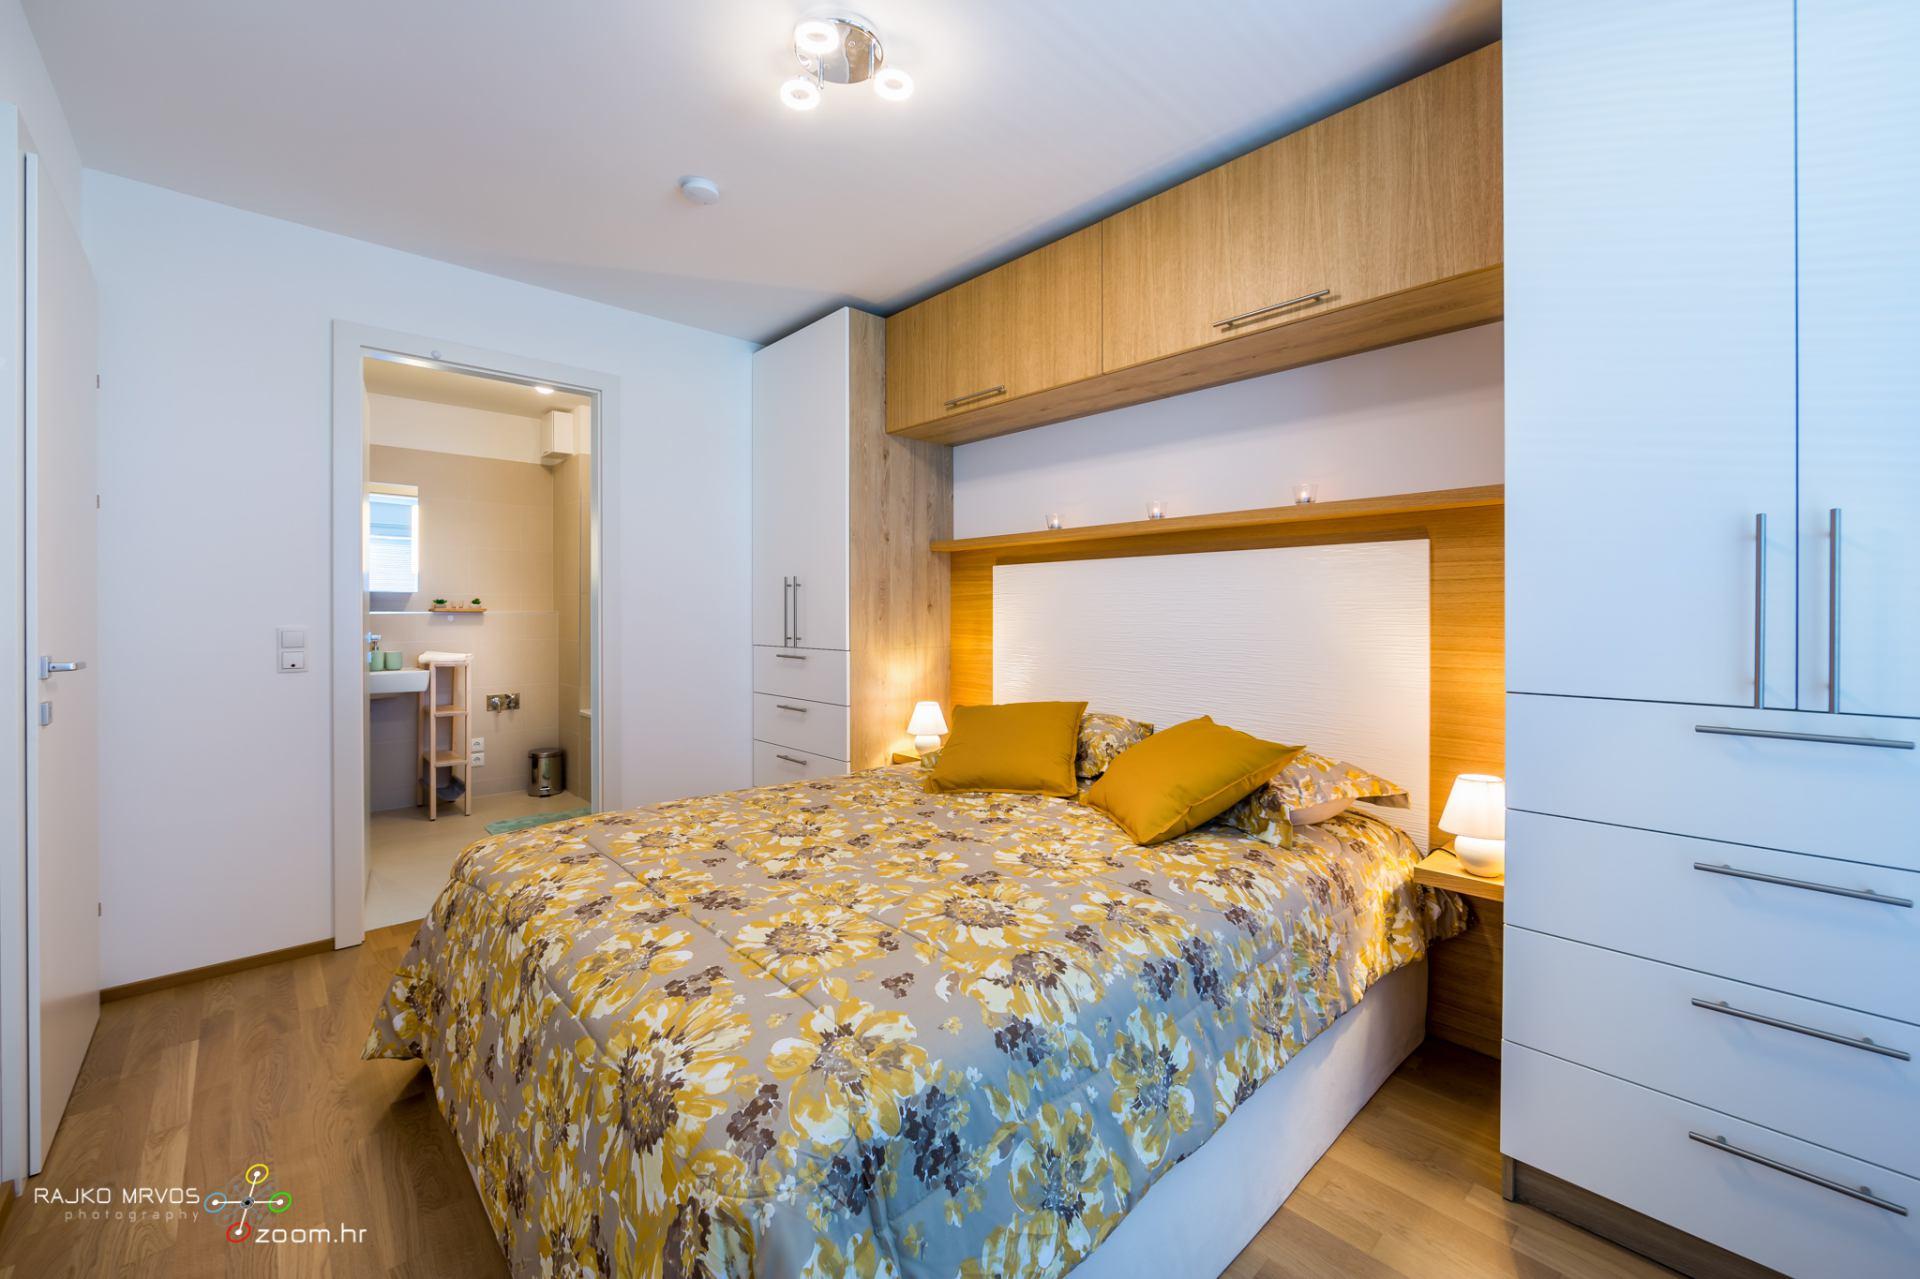 fotografiranje-interijera-fotograf-eksterijera-apartmana-vila-kuca-apartman-Beč-34